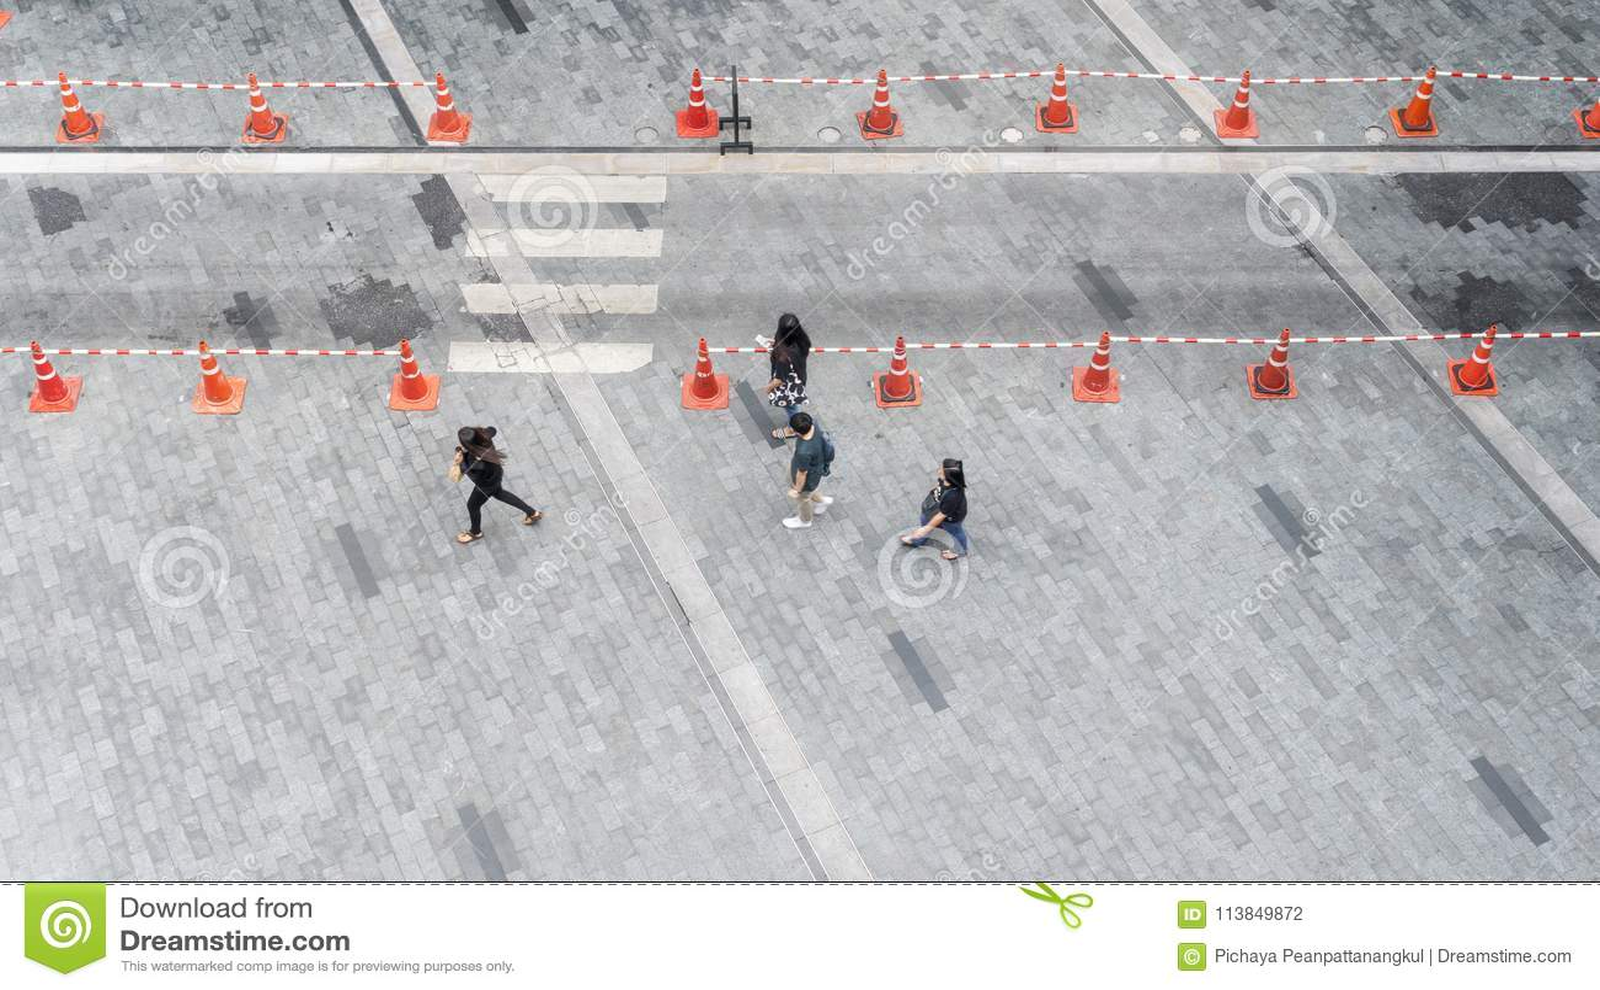 People walk on the pedestrian city street walkway on pavement co